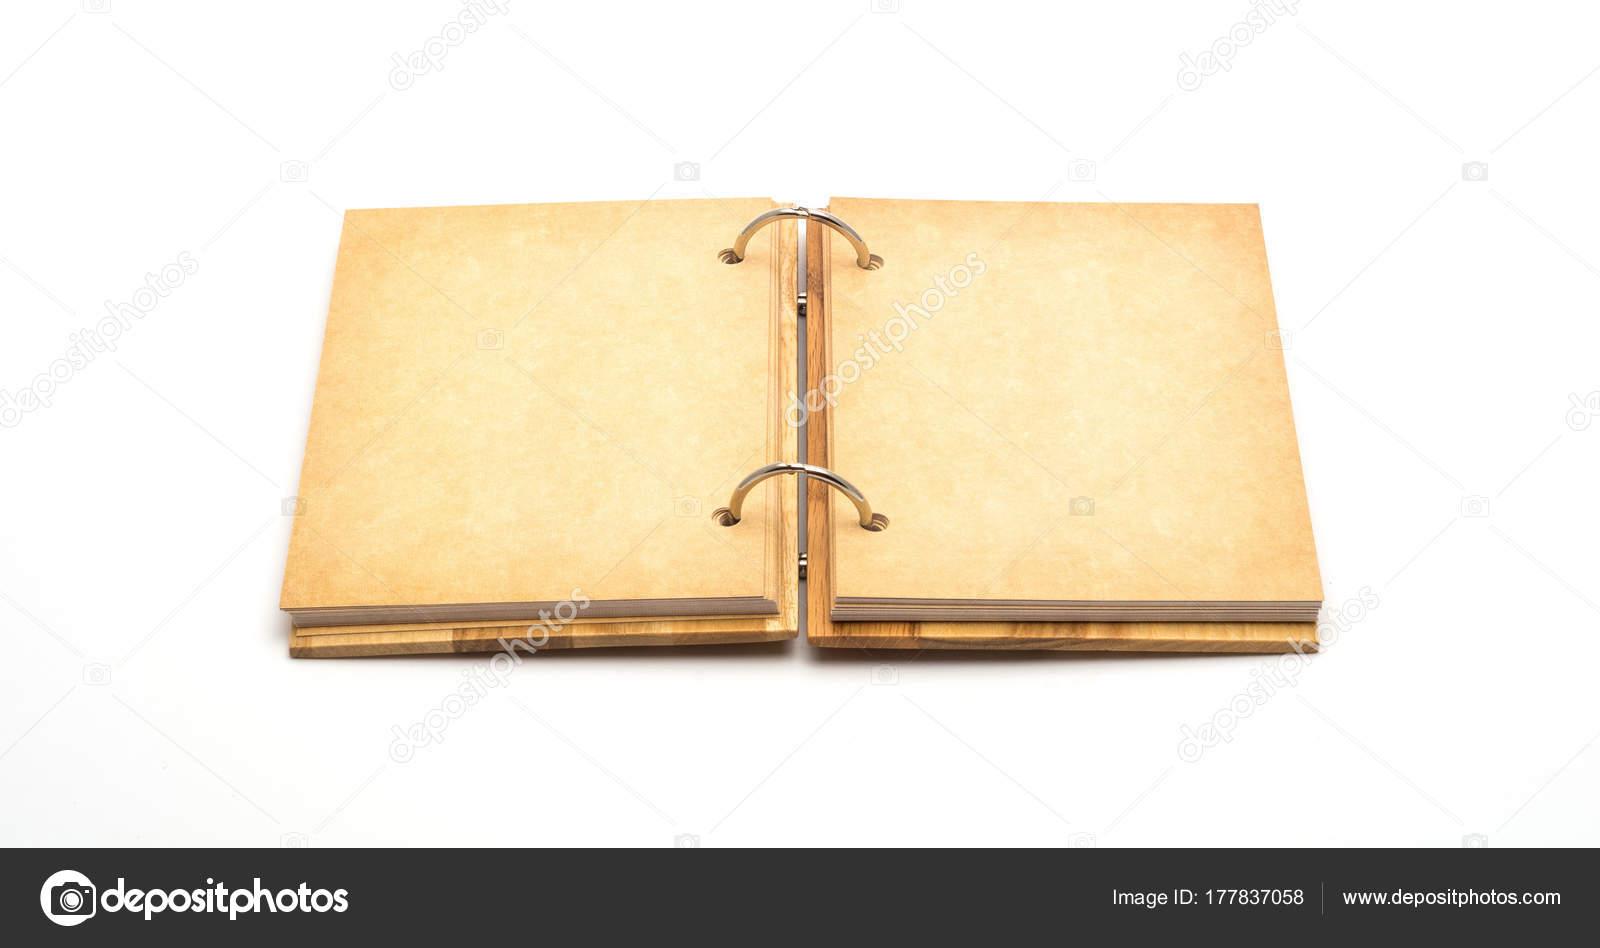 0283f1de2a Ένα σημειωματάριο ανοιχτό λευκώματος με μια κάλυψη φιαγμένη από φυσικά υλικά  — Εικόνα από ...